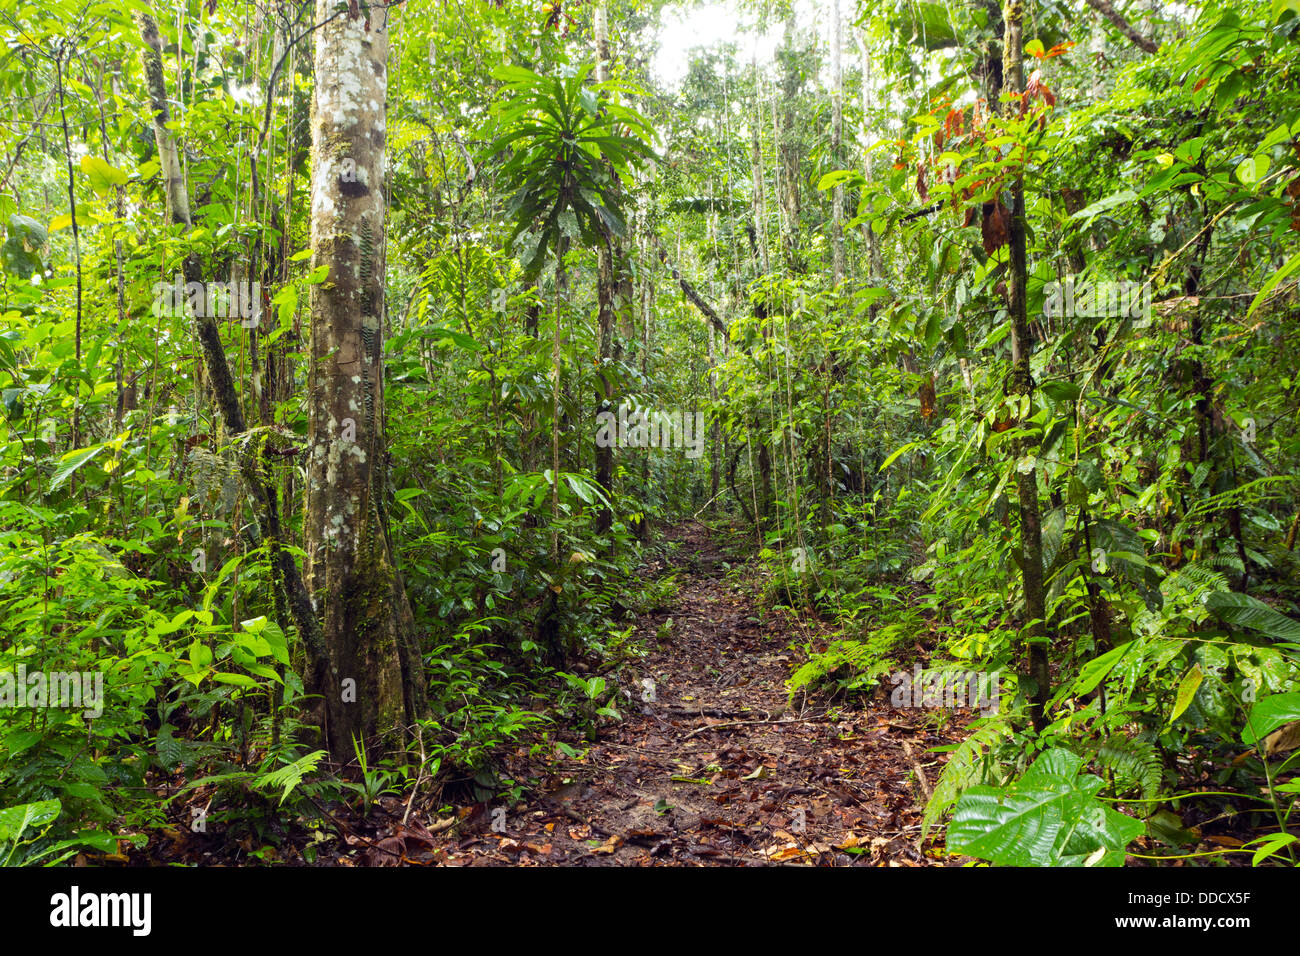 Weg durch tropischen Regenwald im ecuadorianischen Amazonasgebiet Stockbild